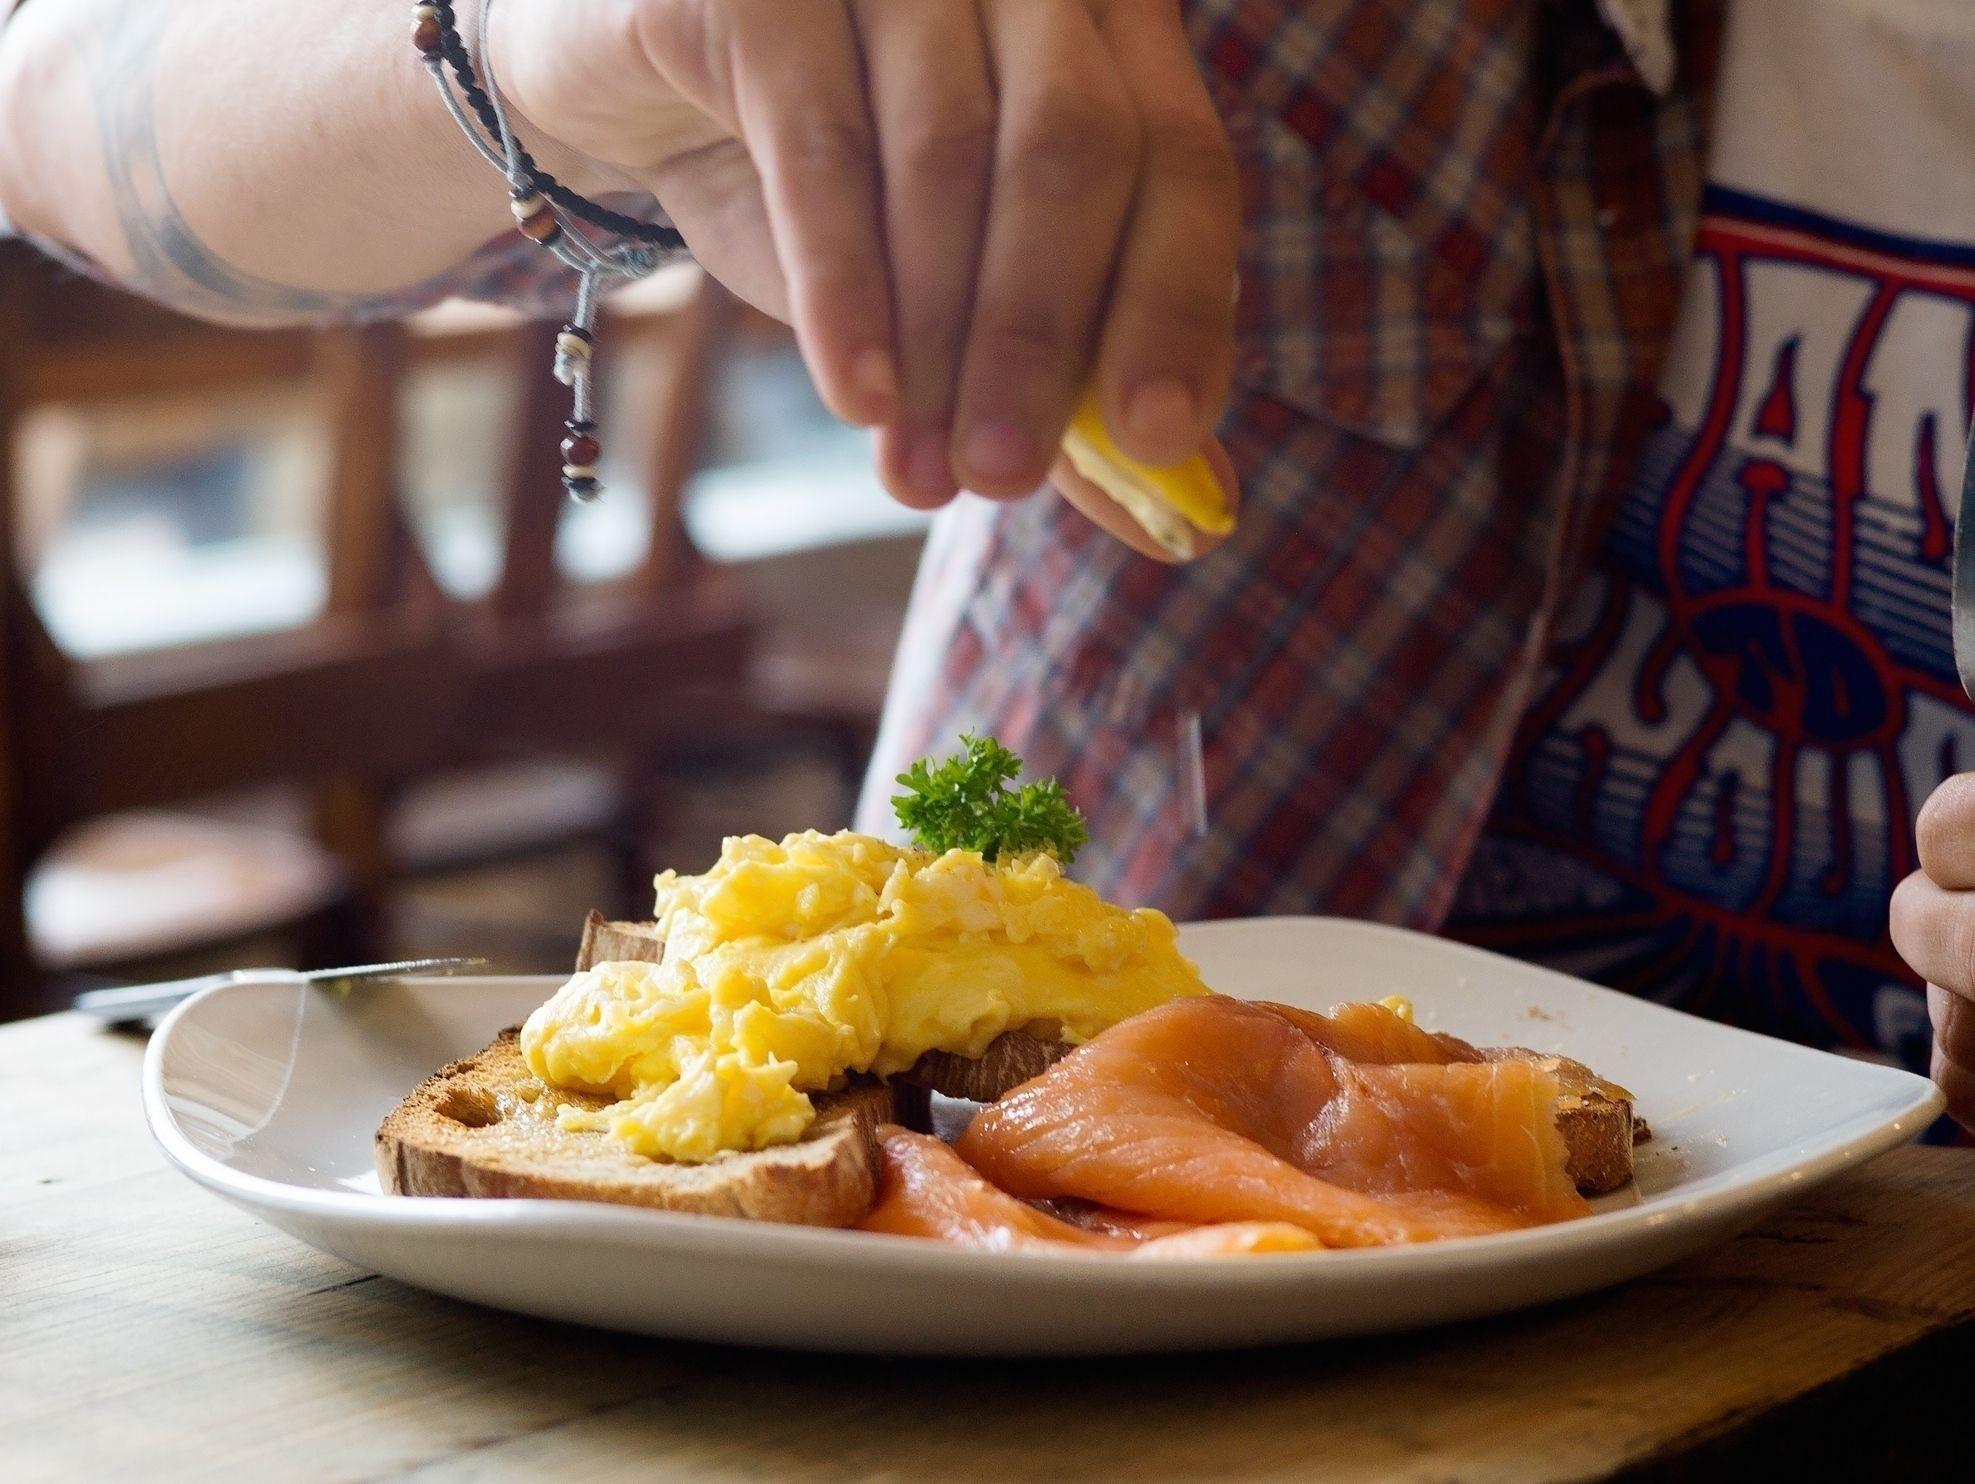 Akis petretzikis scrambled eggs 3